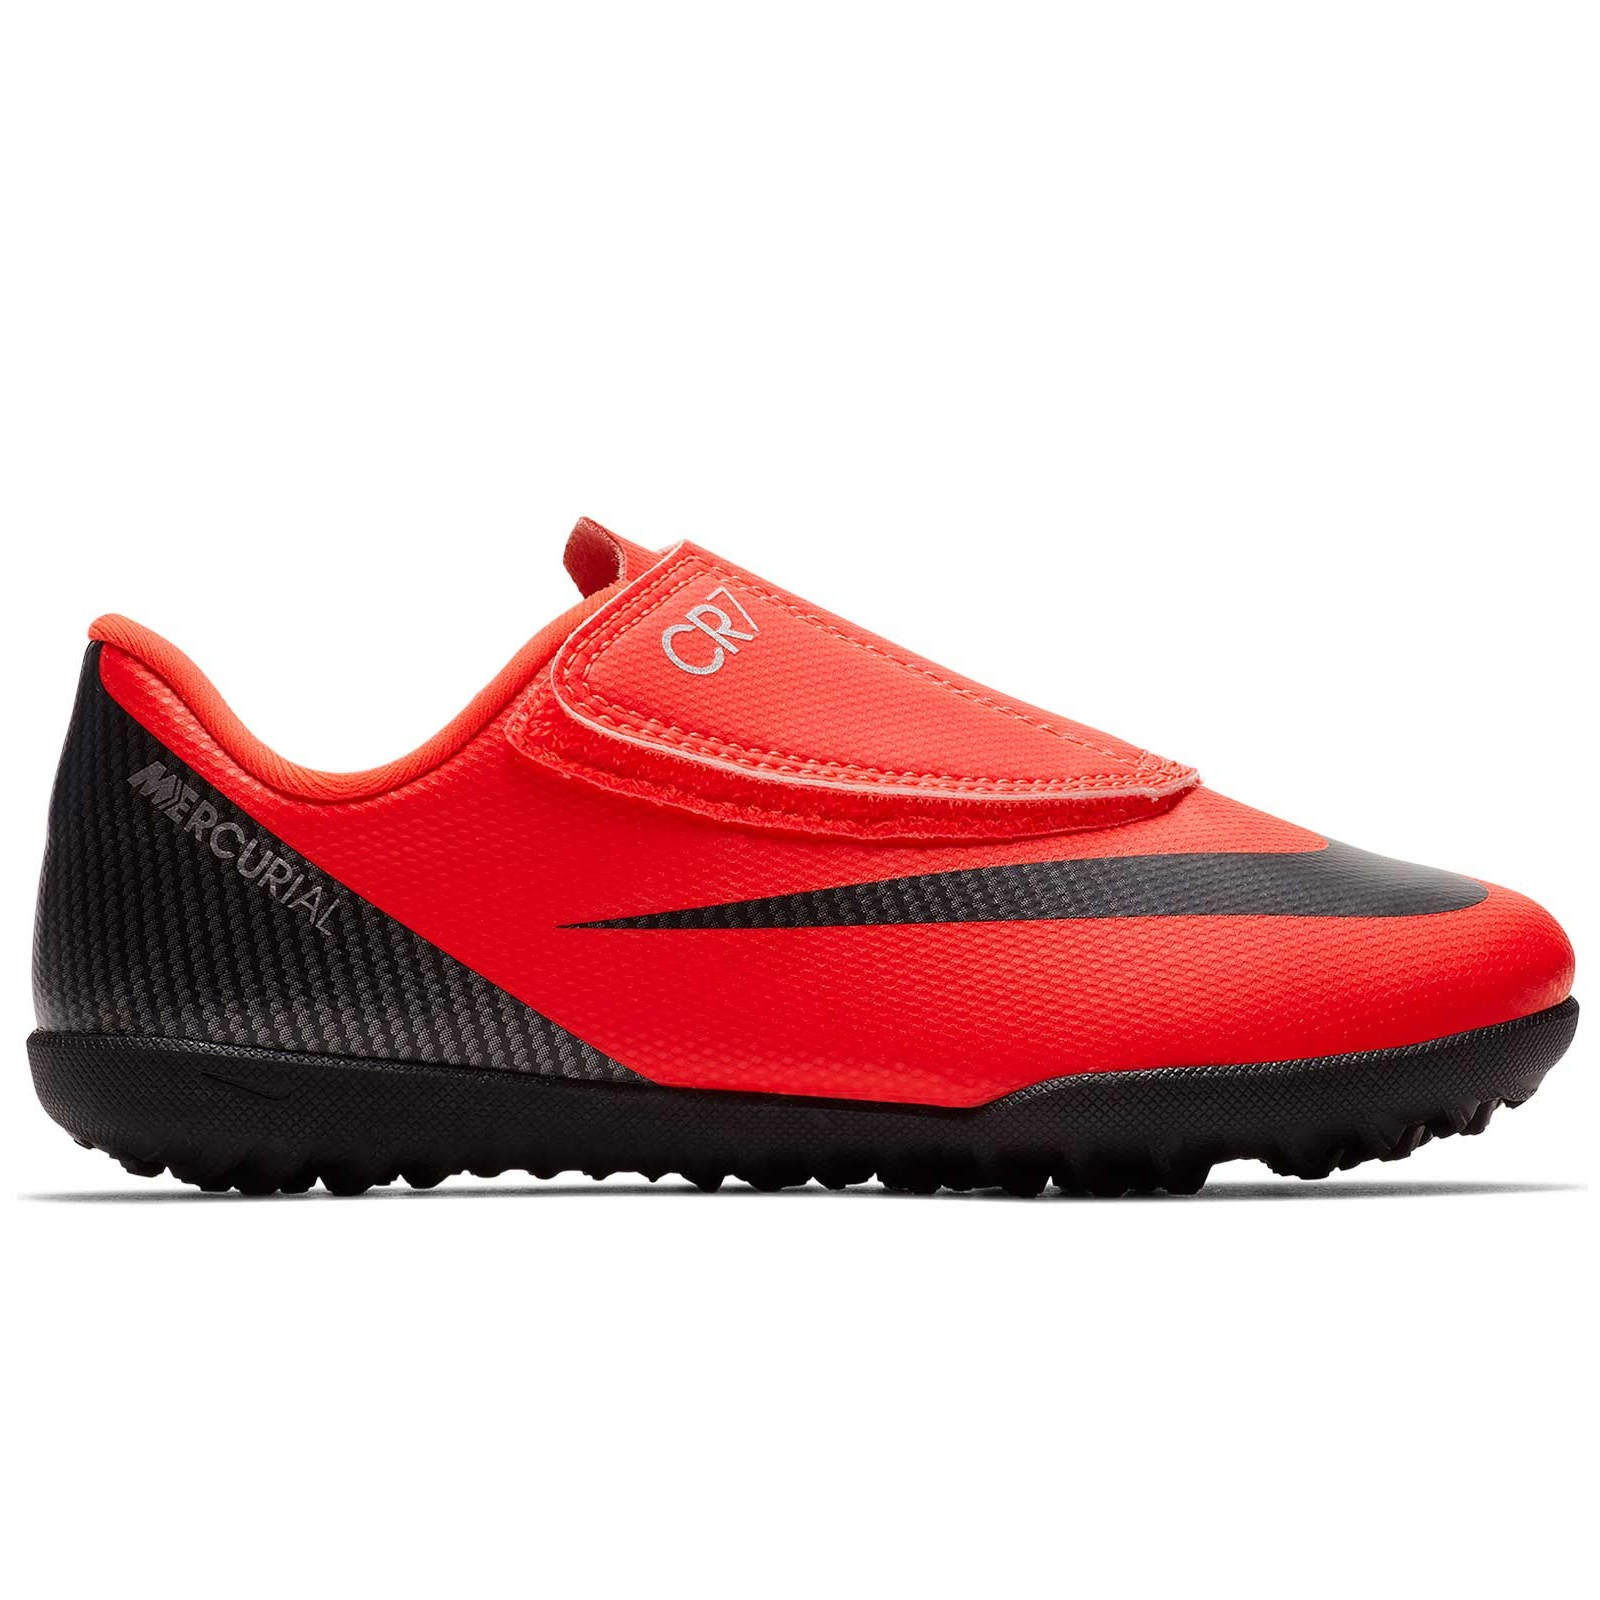 30cdf98d83d Zapatillas fútbol Nike VaporX 12 club CR7 psv naranja niño - Deportes Moya